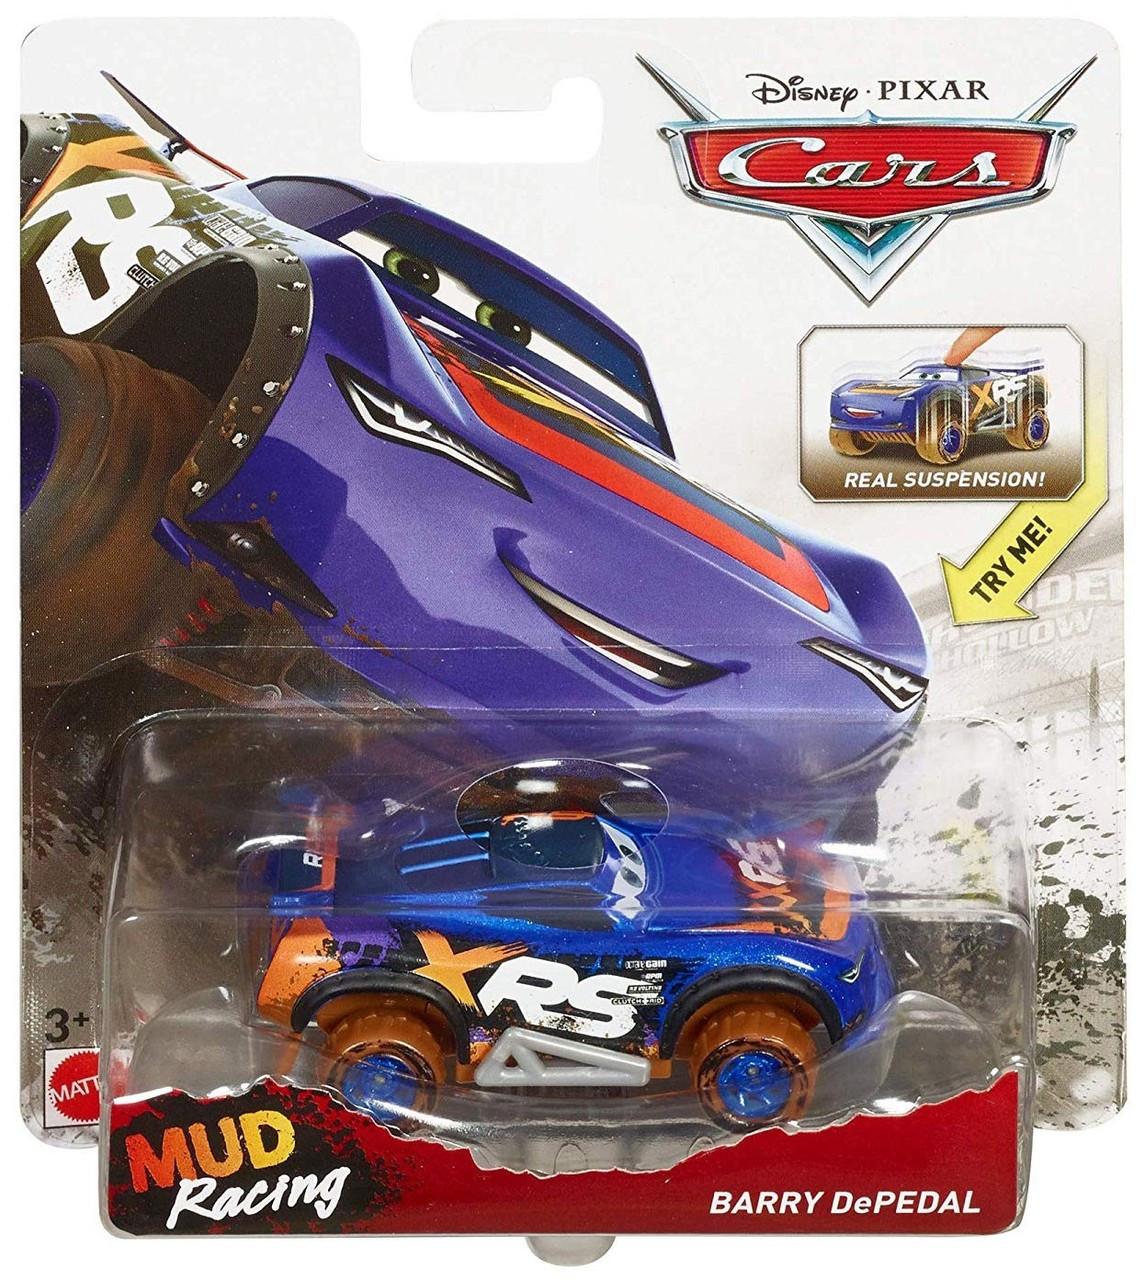 Disney Pixar Cars Cars 3 Xrs Mud Racing Barry Depedal Diecast Car